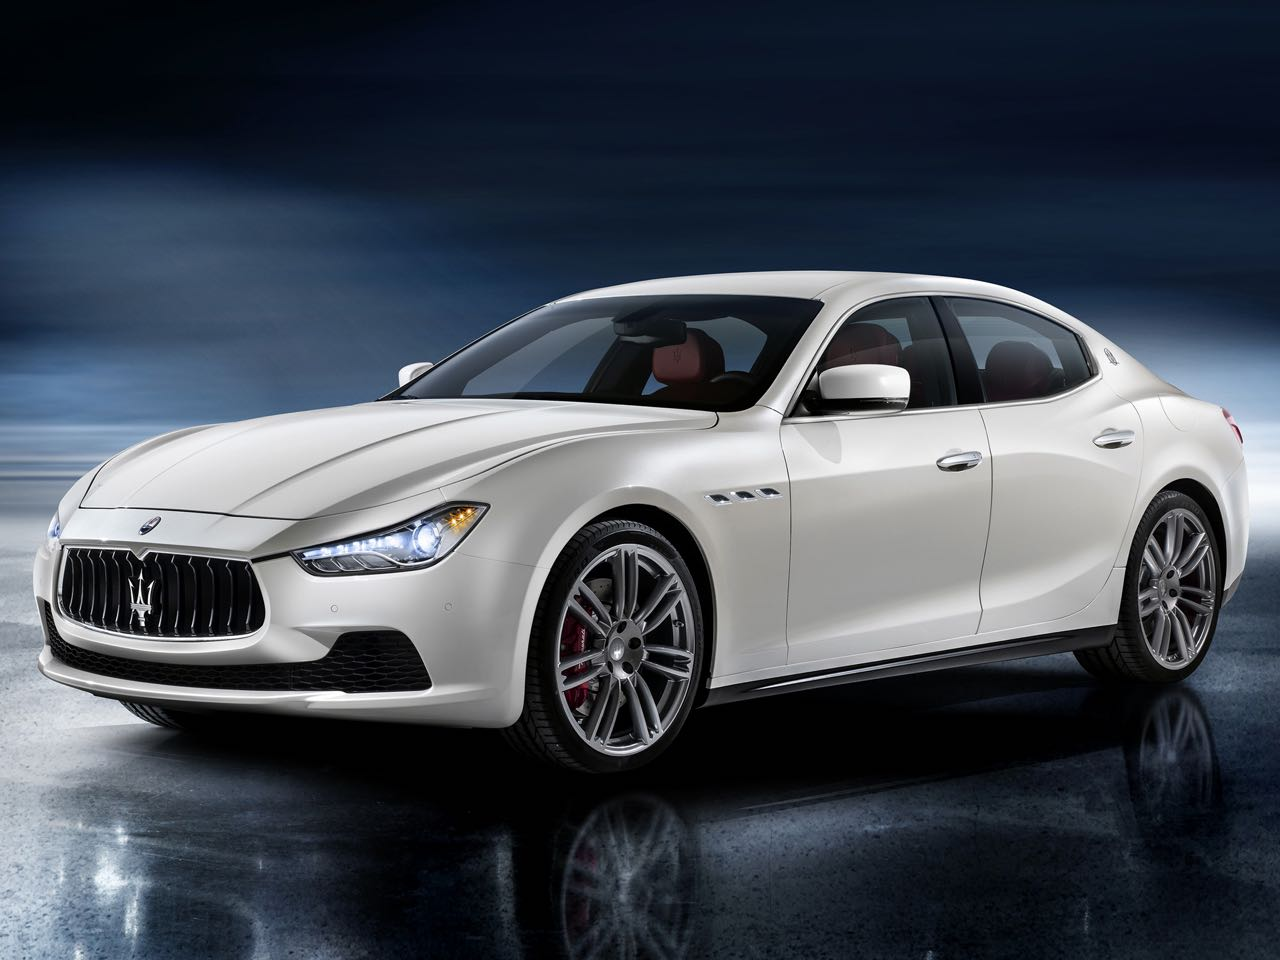 Maserati Ghibli 2014 – 5